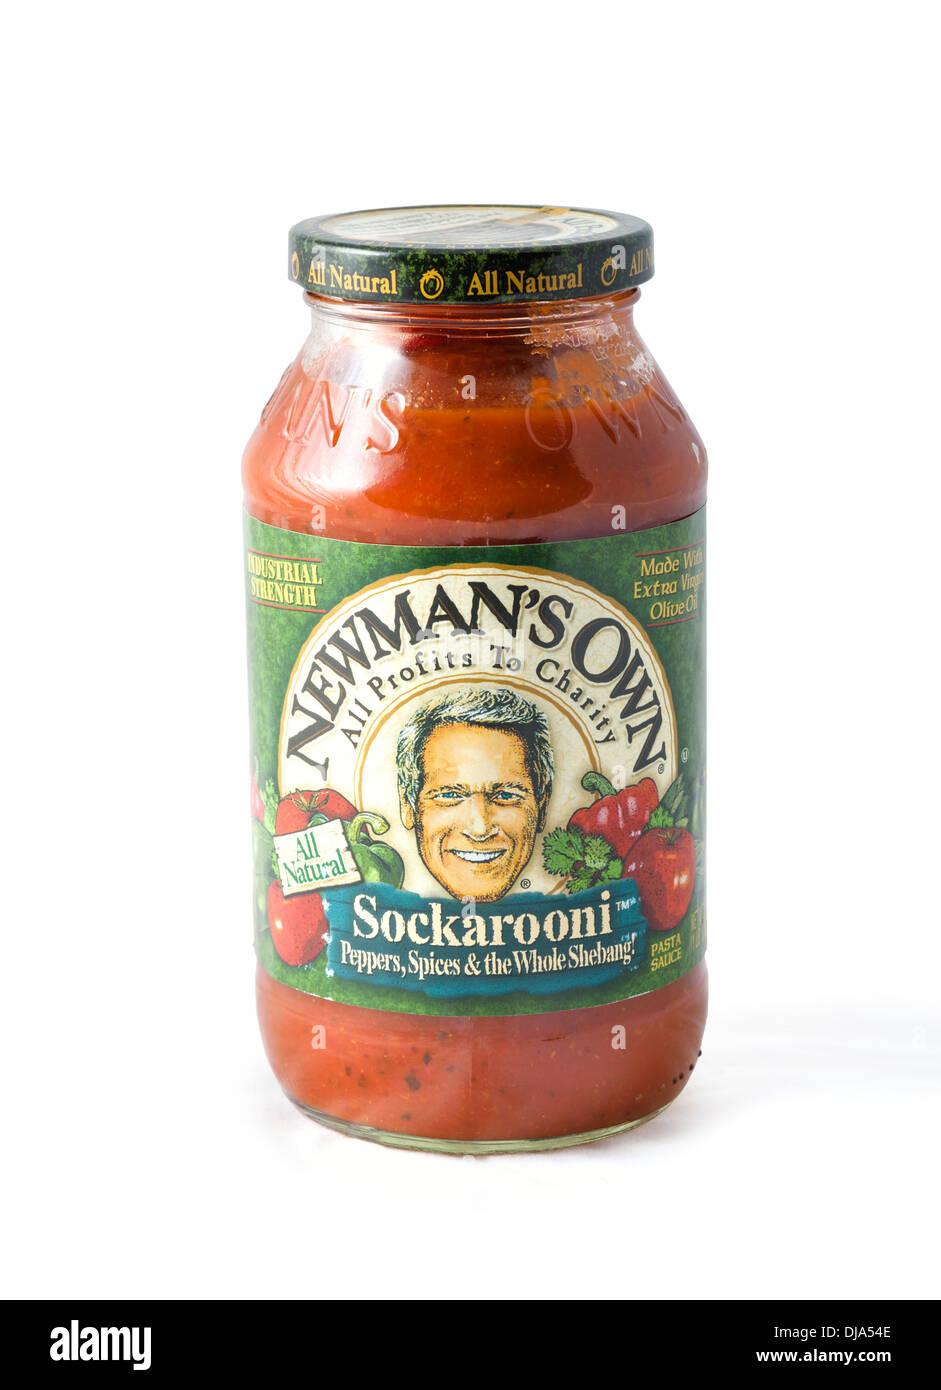 Tarro de Newman la propia Sockarooni salsa para pastas, EE.UU. Imagen De Stock